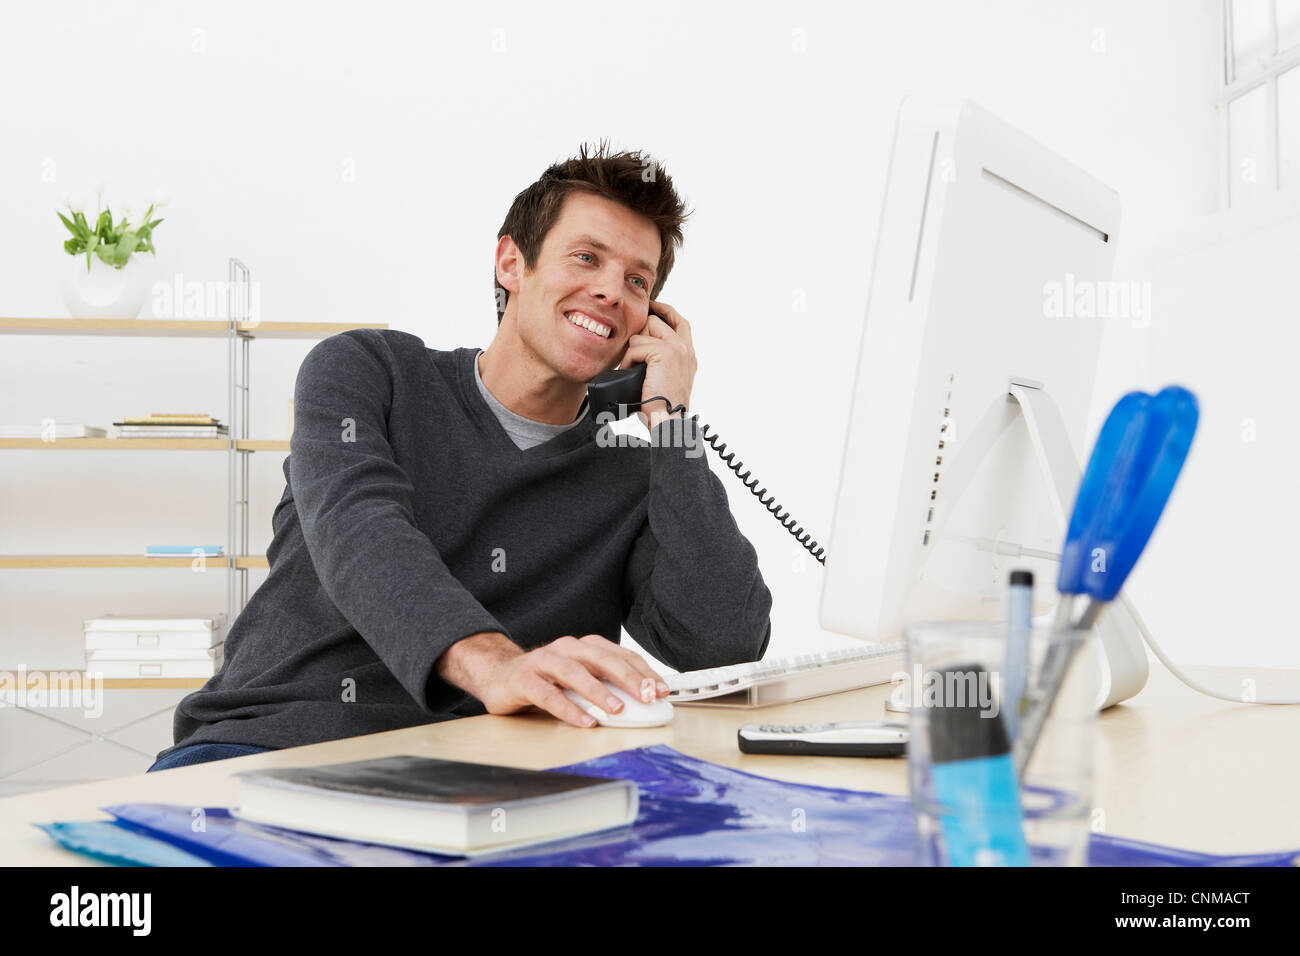 Businessman talking on phone at work - Stock Image